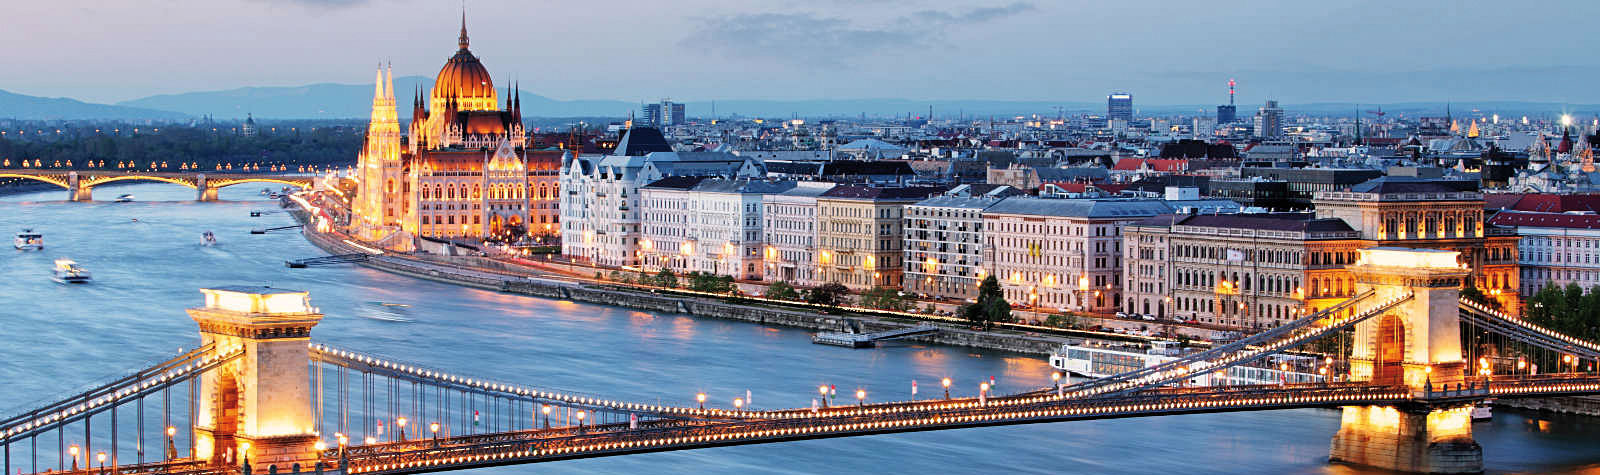 DonauBudapest